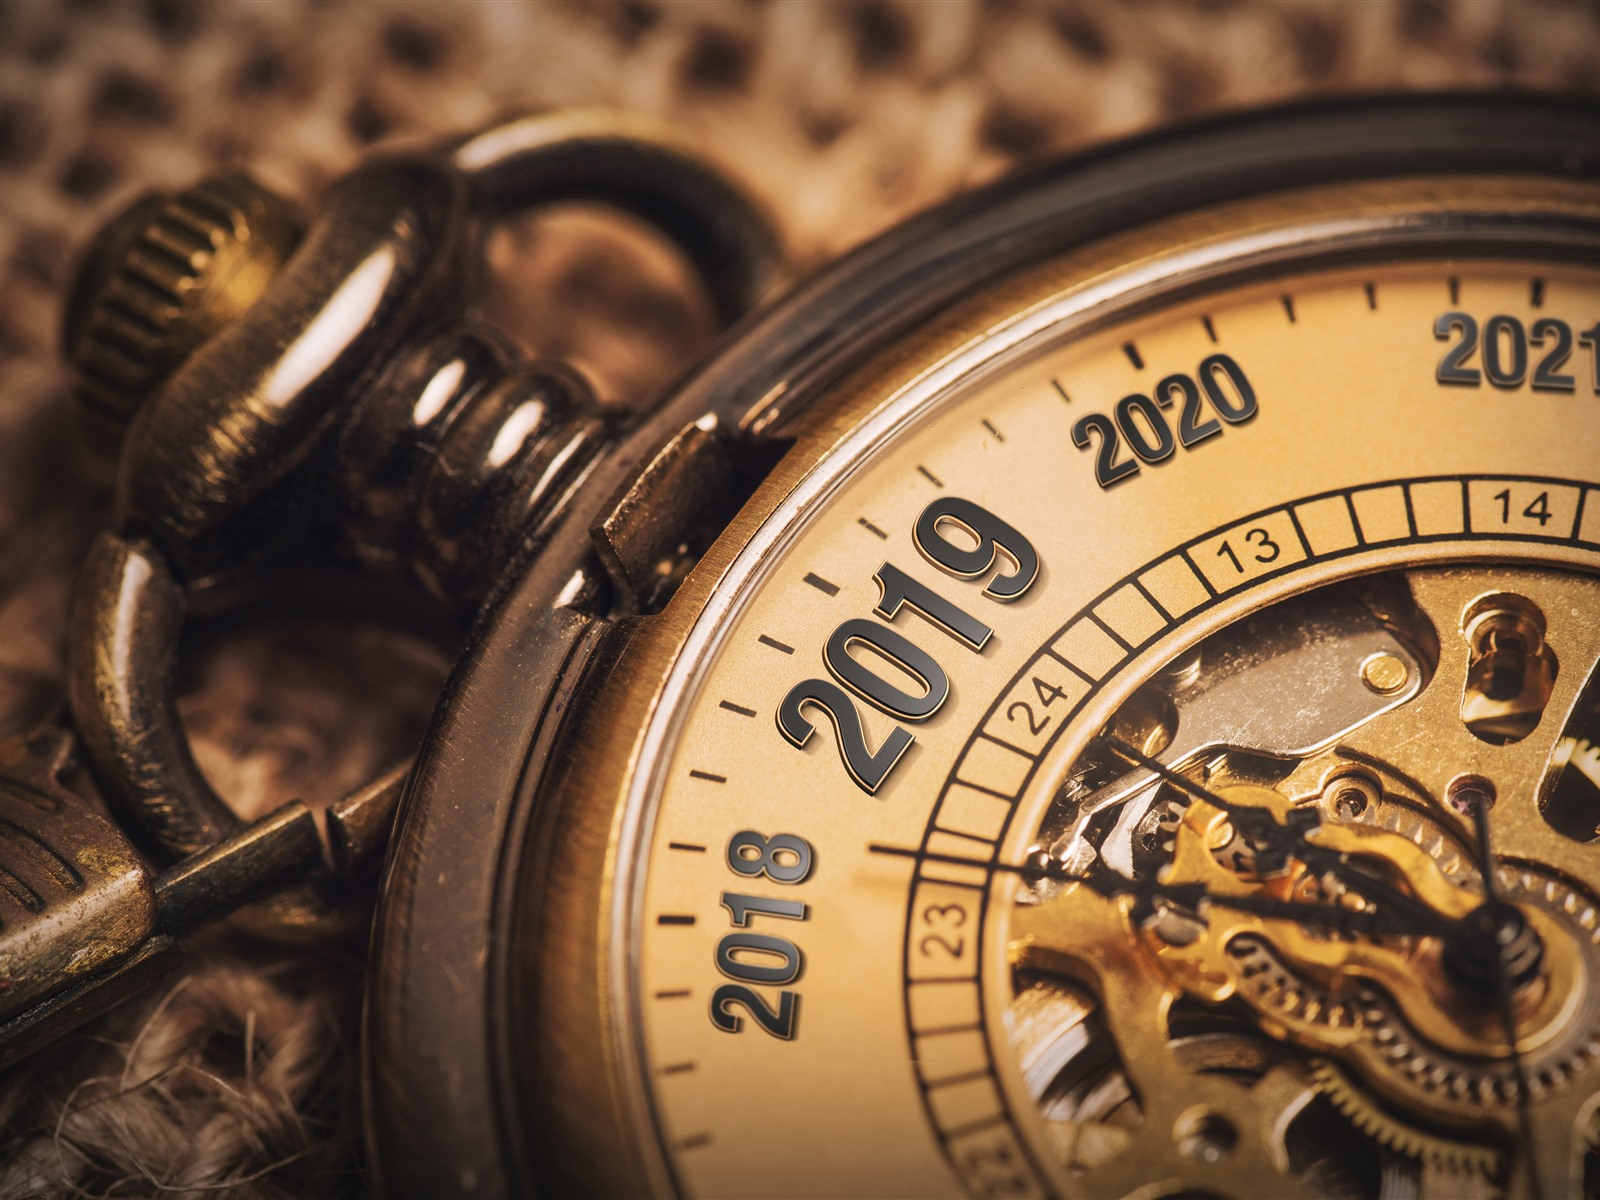 Wallpaper Pocket Watch New Year 2019 5120x2880 Uhd 5k